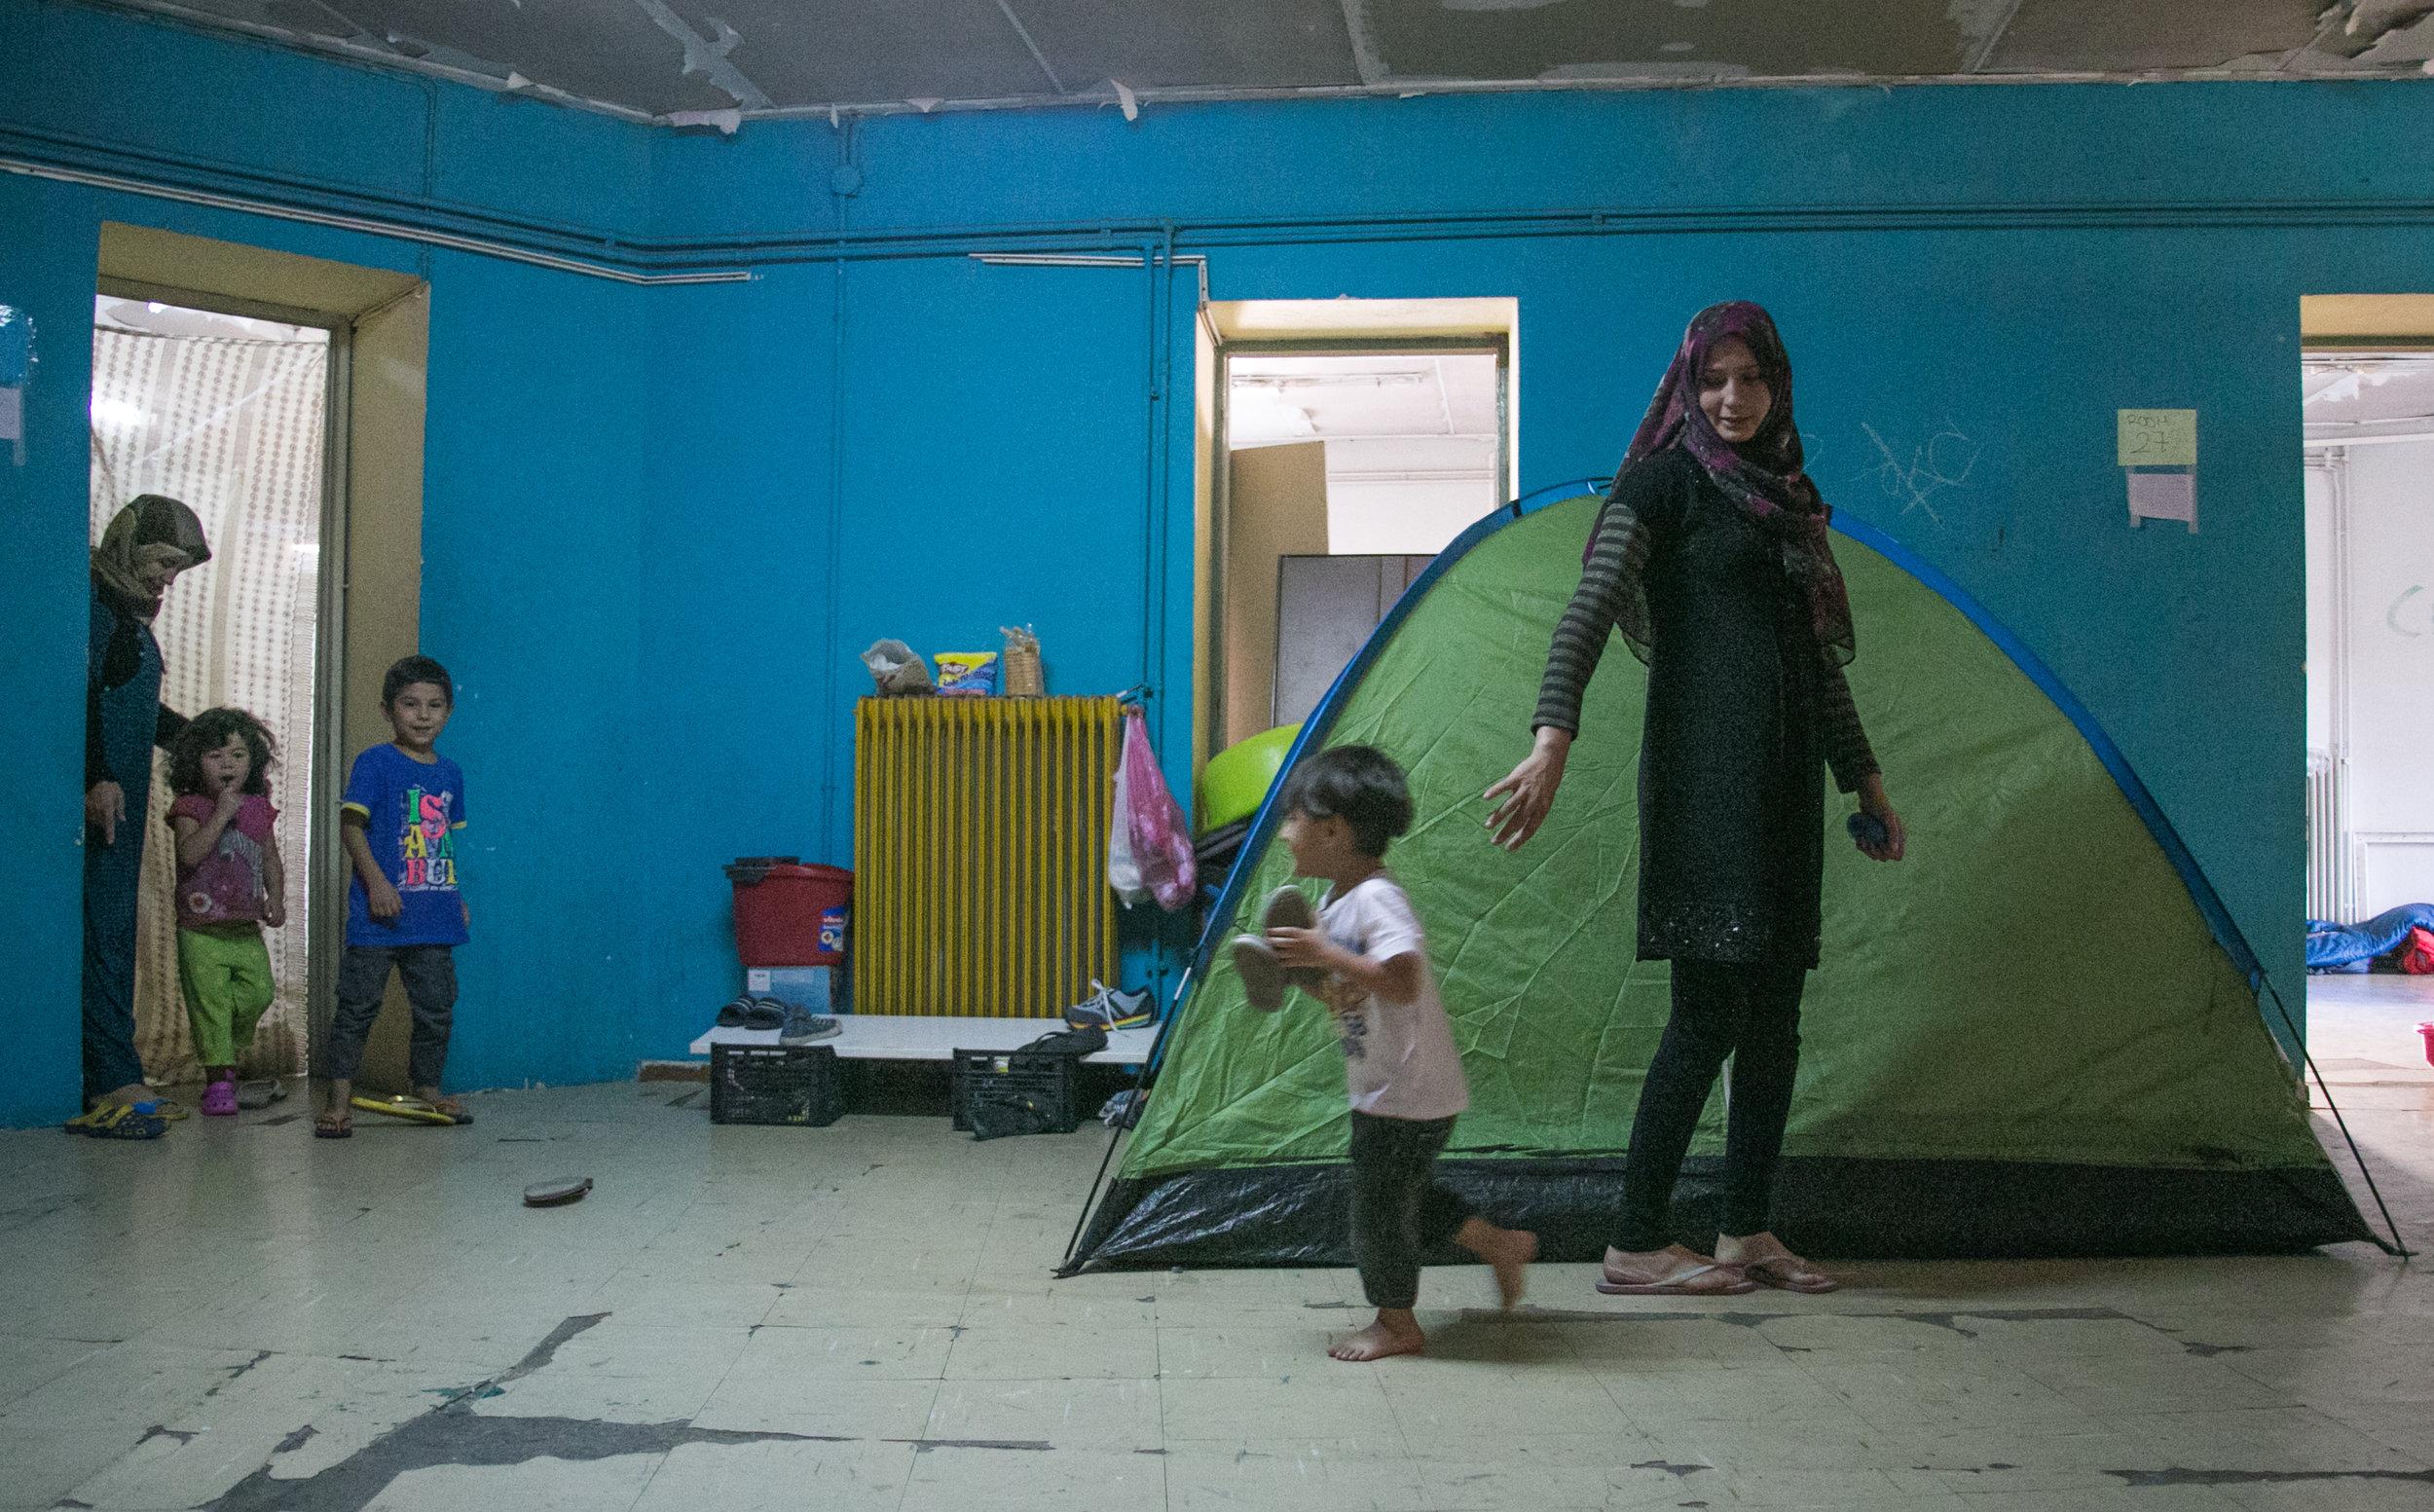 10/19/16 -Jasmine Refugee Squat - The In-Between - Adobe Spark - Athens, Greece